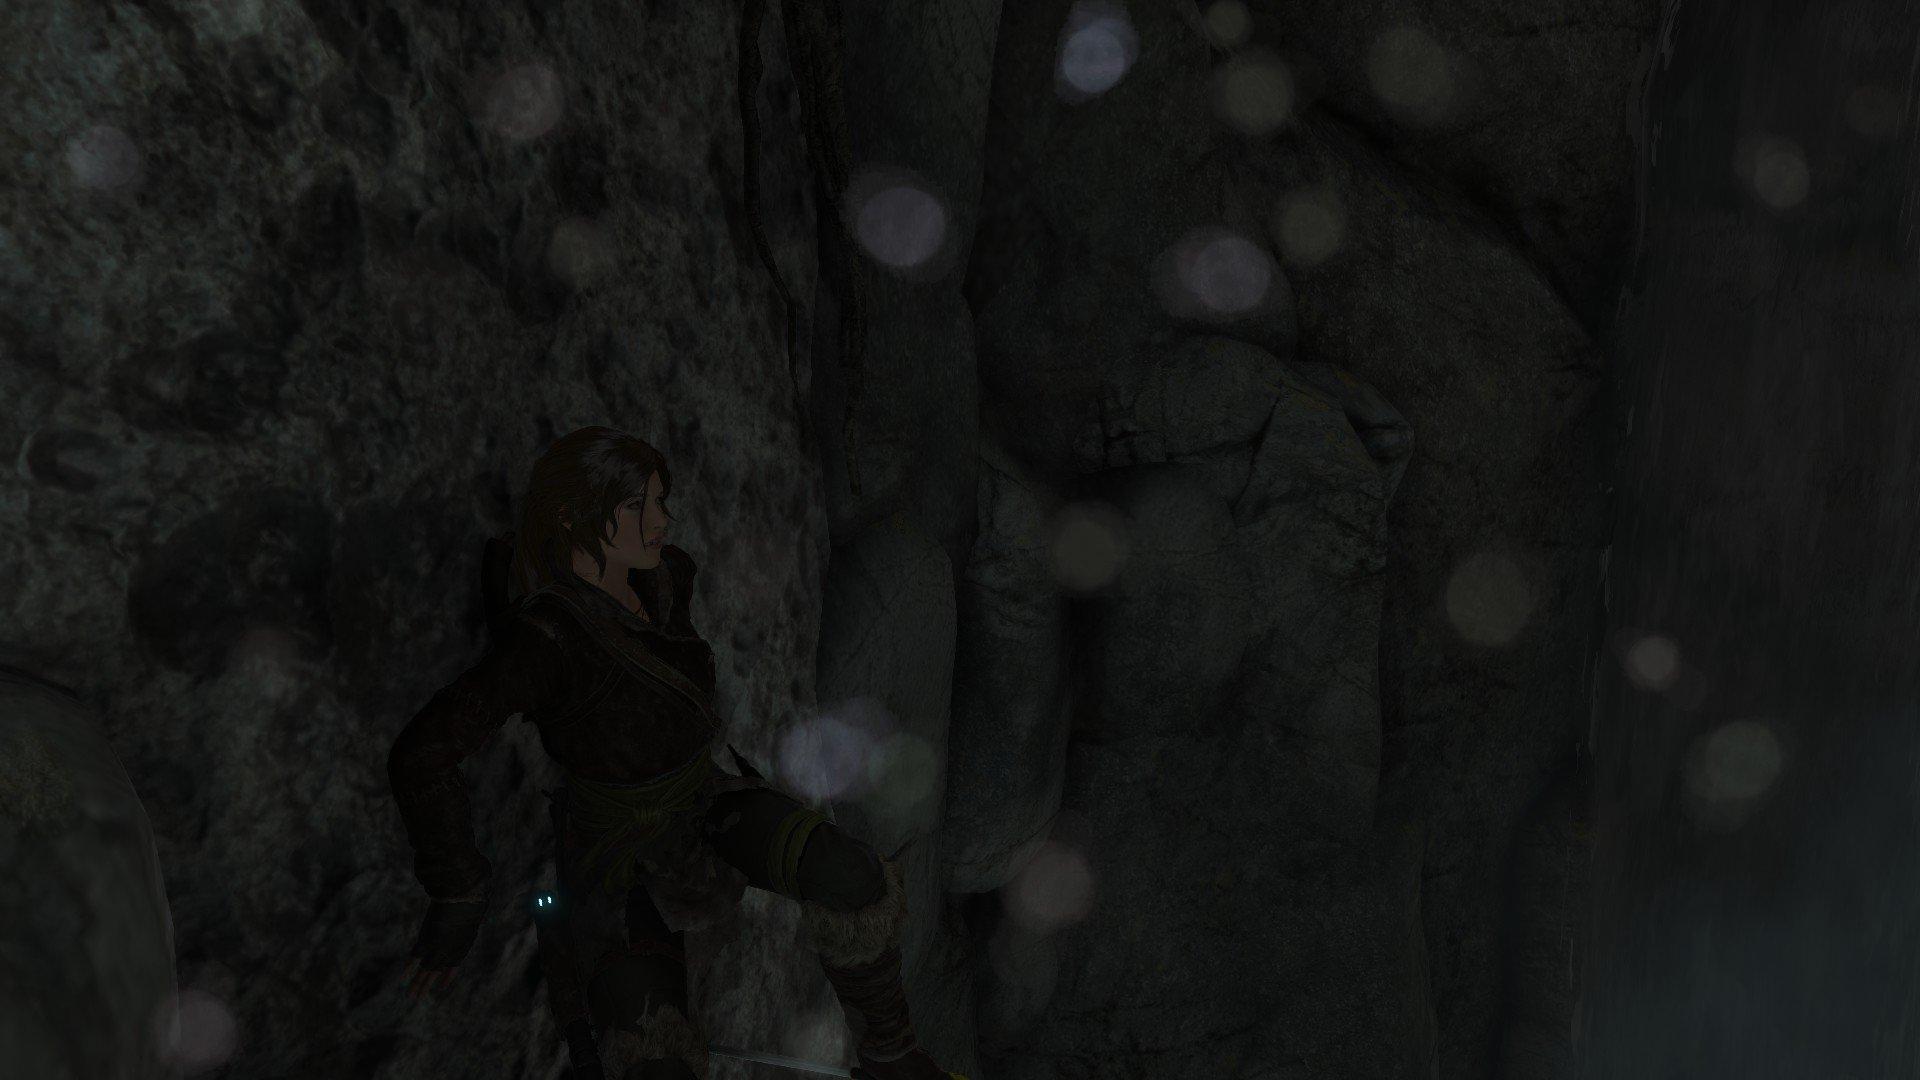 Rise of the Tomb Raider или да когда же этот медведь сдохнет?. - Изображение 24